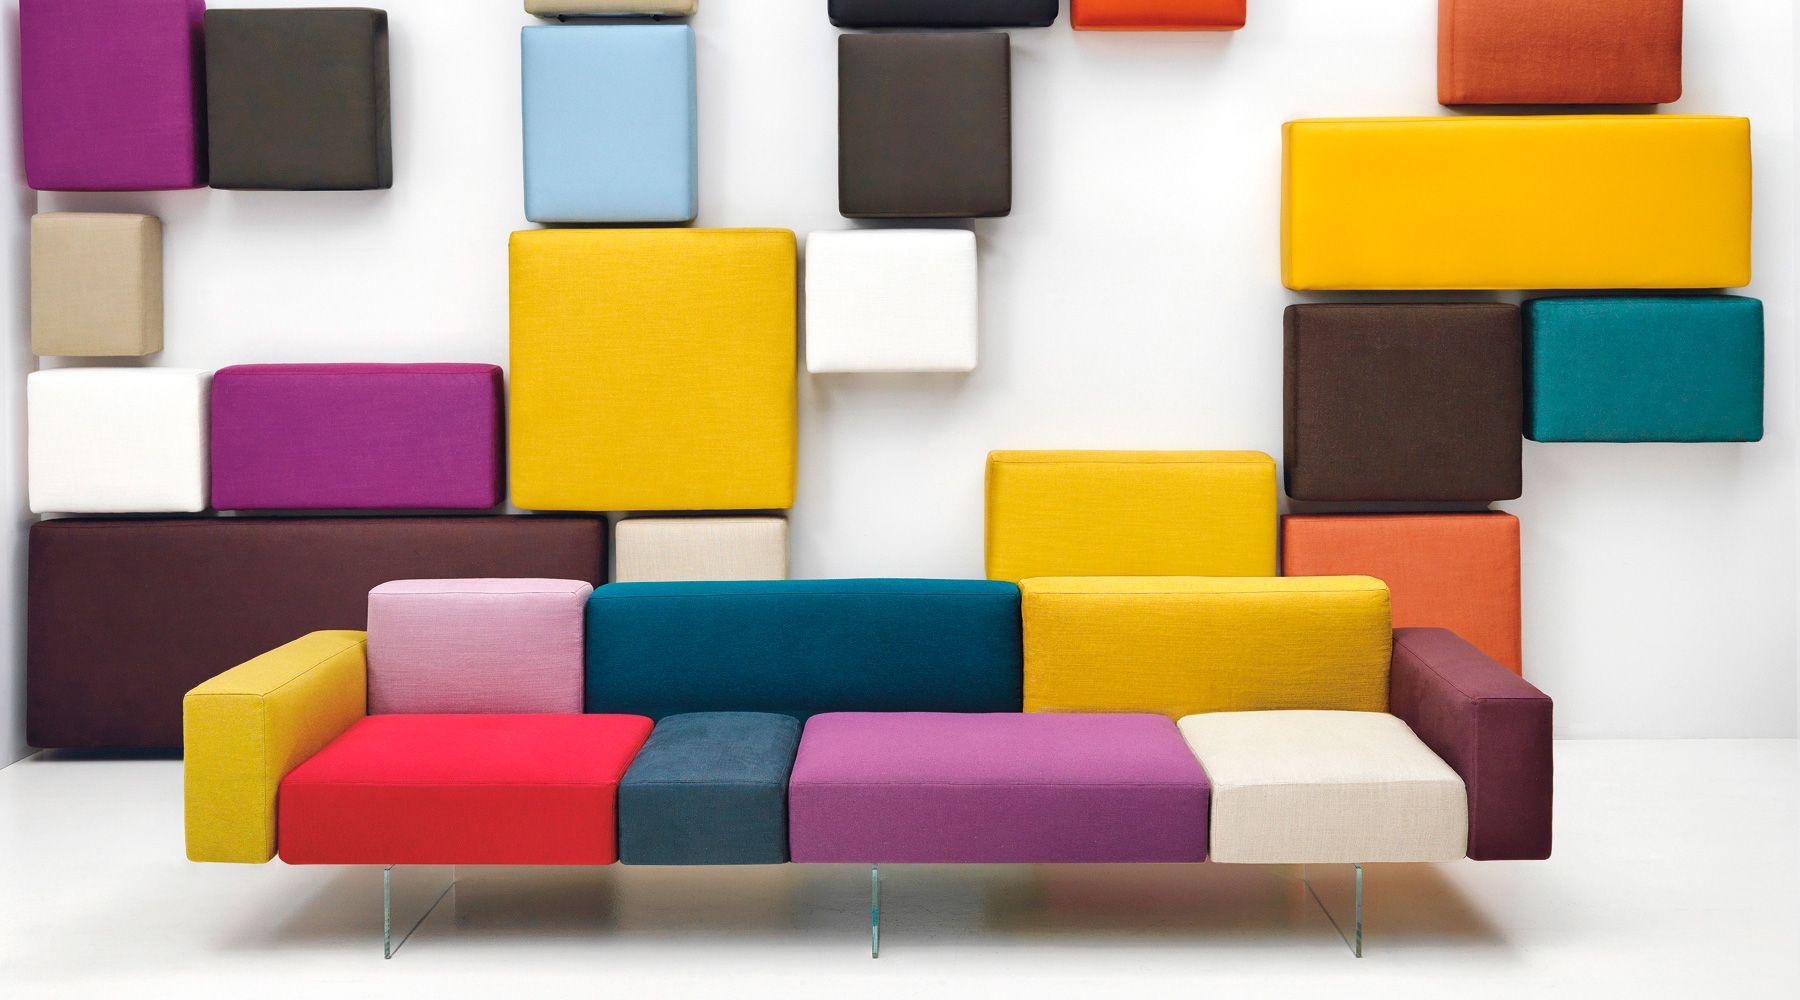 Divano Tetris ~ Divano modulare lagodesign lago divano divani e